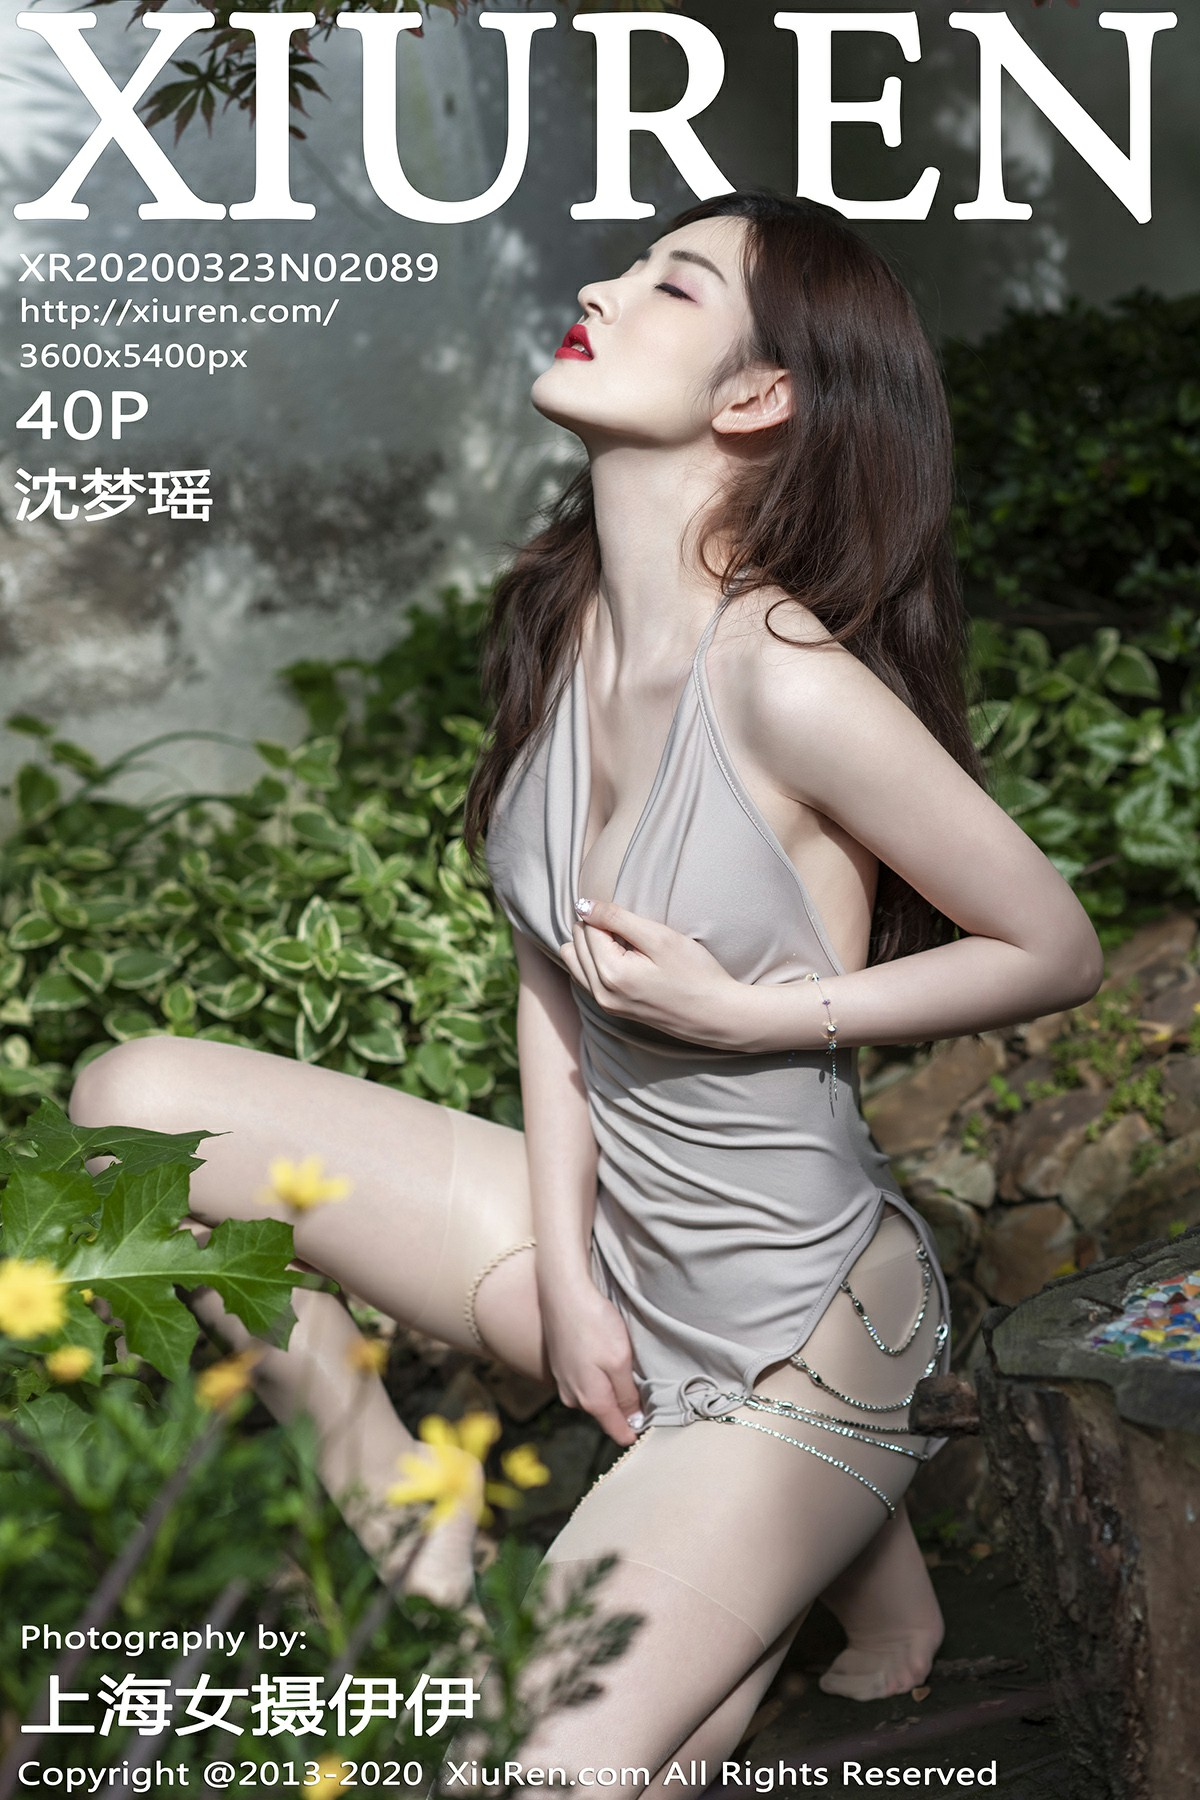 [XiuRen秀人网]2020.03.23 No.2089 沈梦瑶[41P] 秀人网 第1张